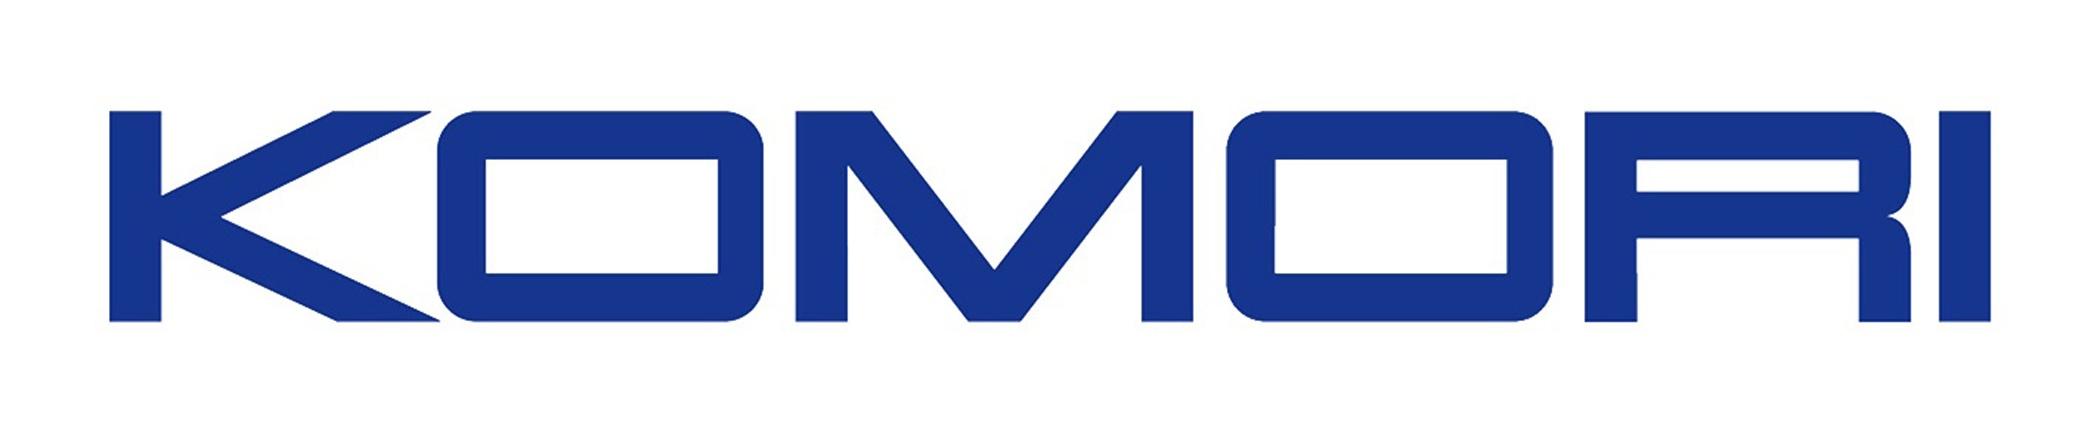 Komori logo blue